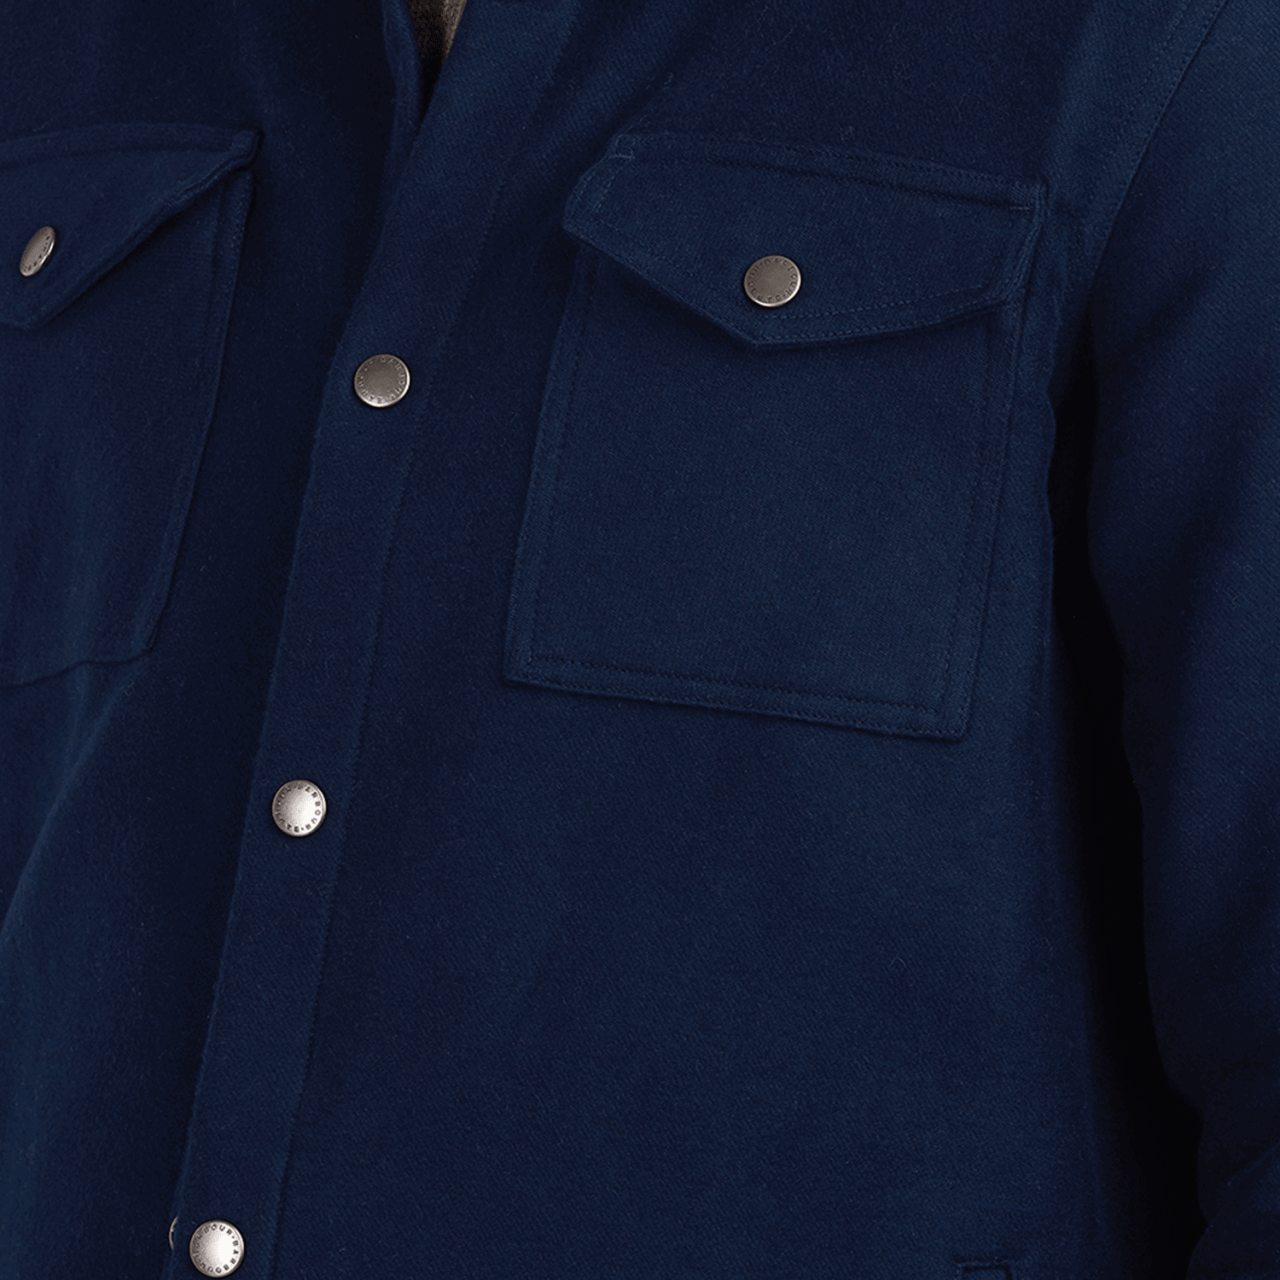 Barbour Carrbridge Overshirt - navy